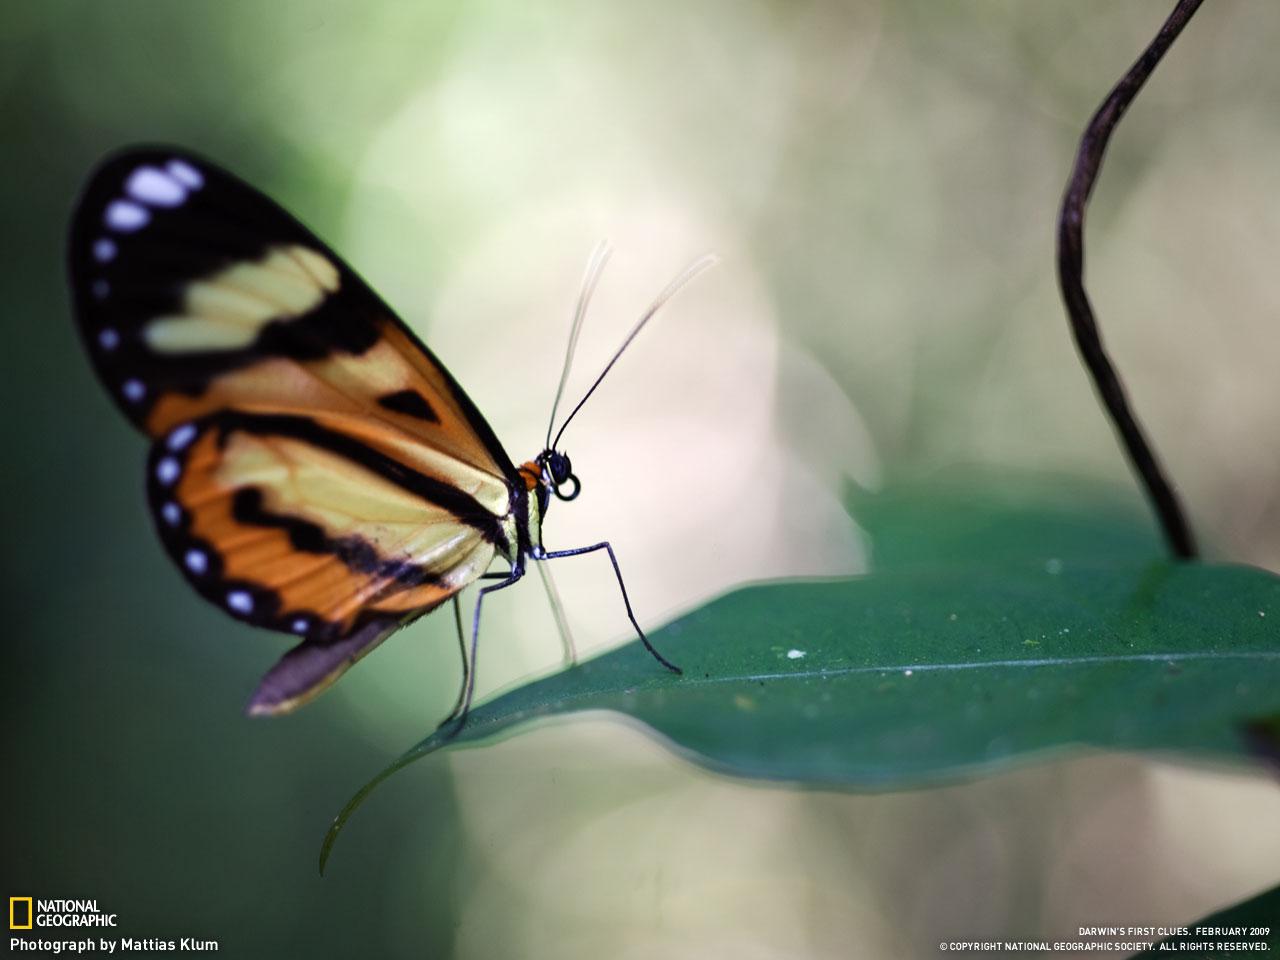 A Hypothyris ninonia daeta butterfly alights on a leaf in Brazil's Atlantic Forest